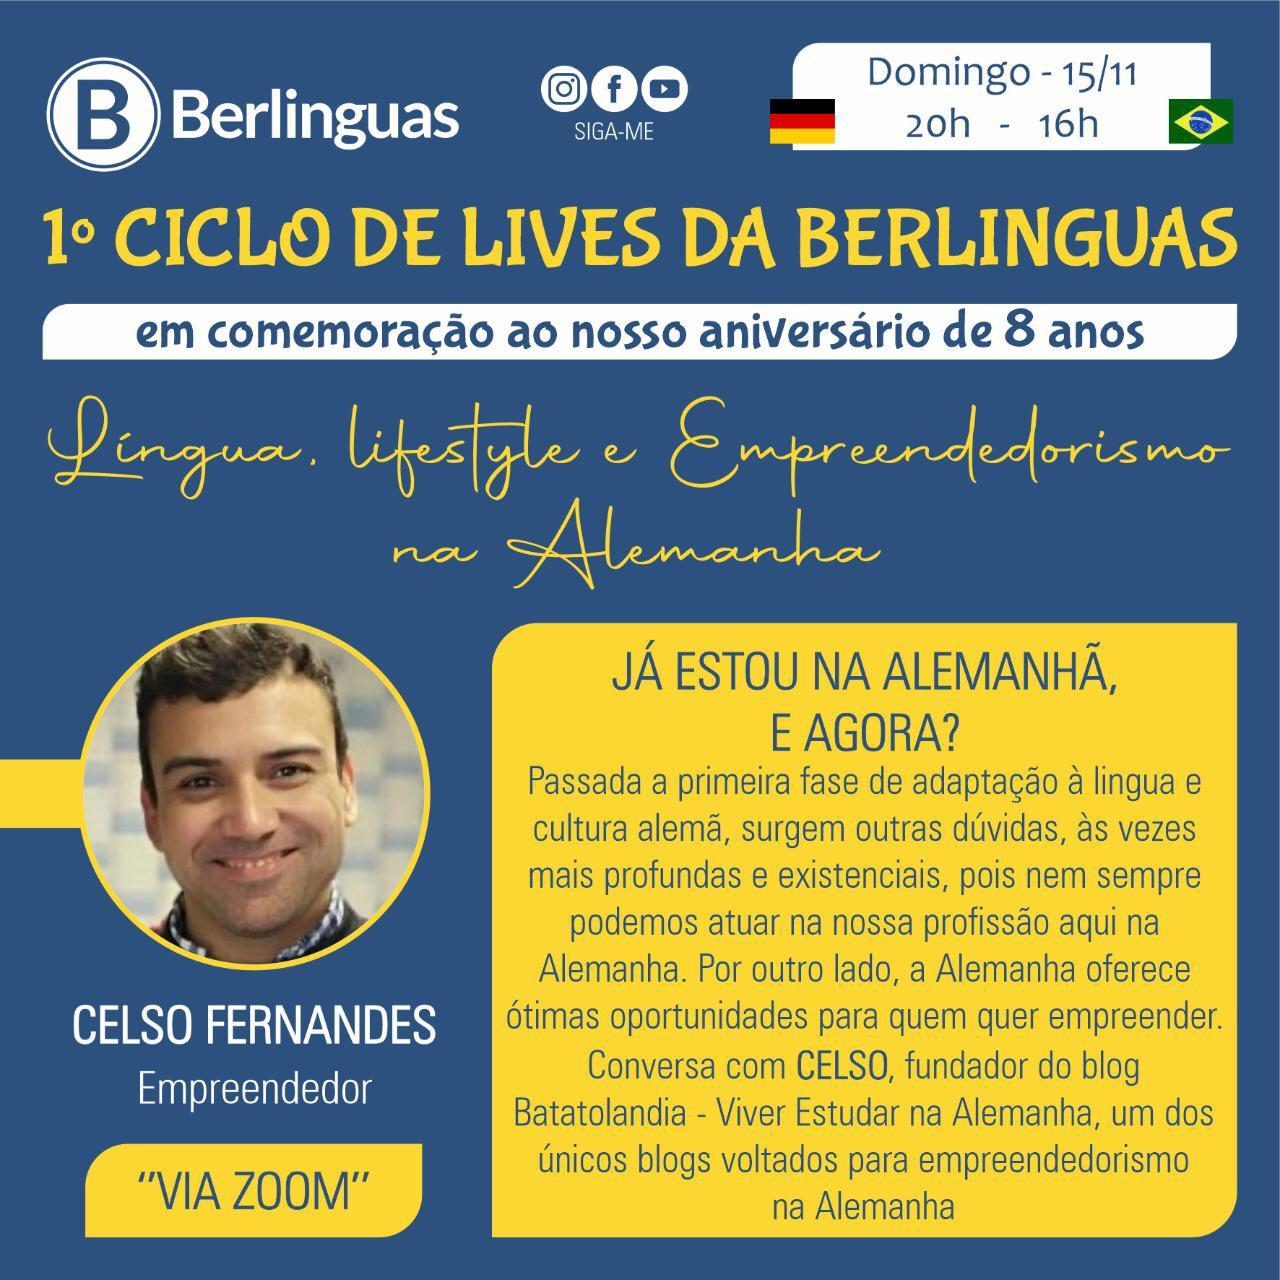 1-ciclo-de-lives-da-berlinguas-celso-fernandes